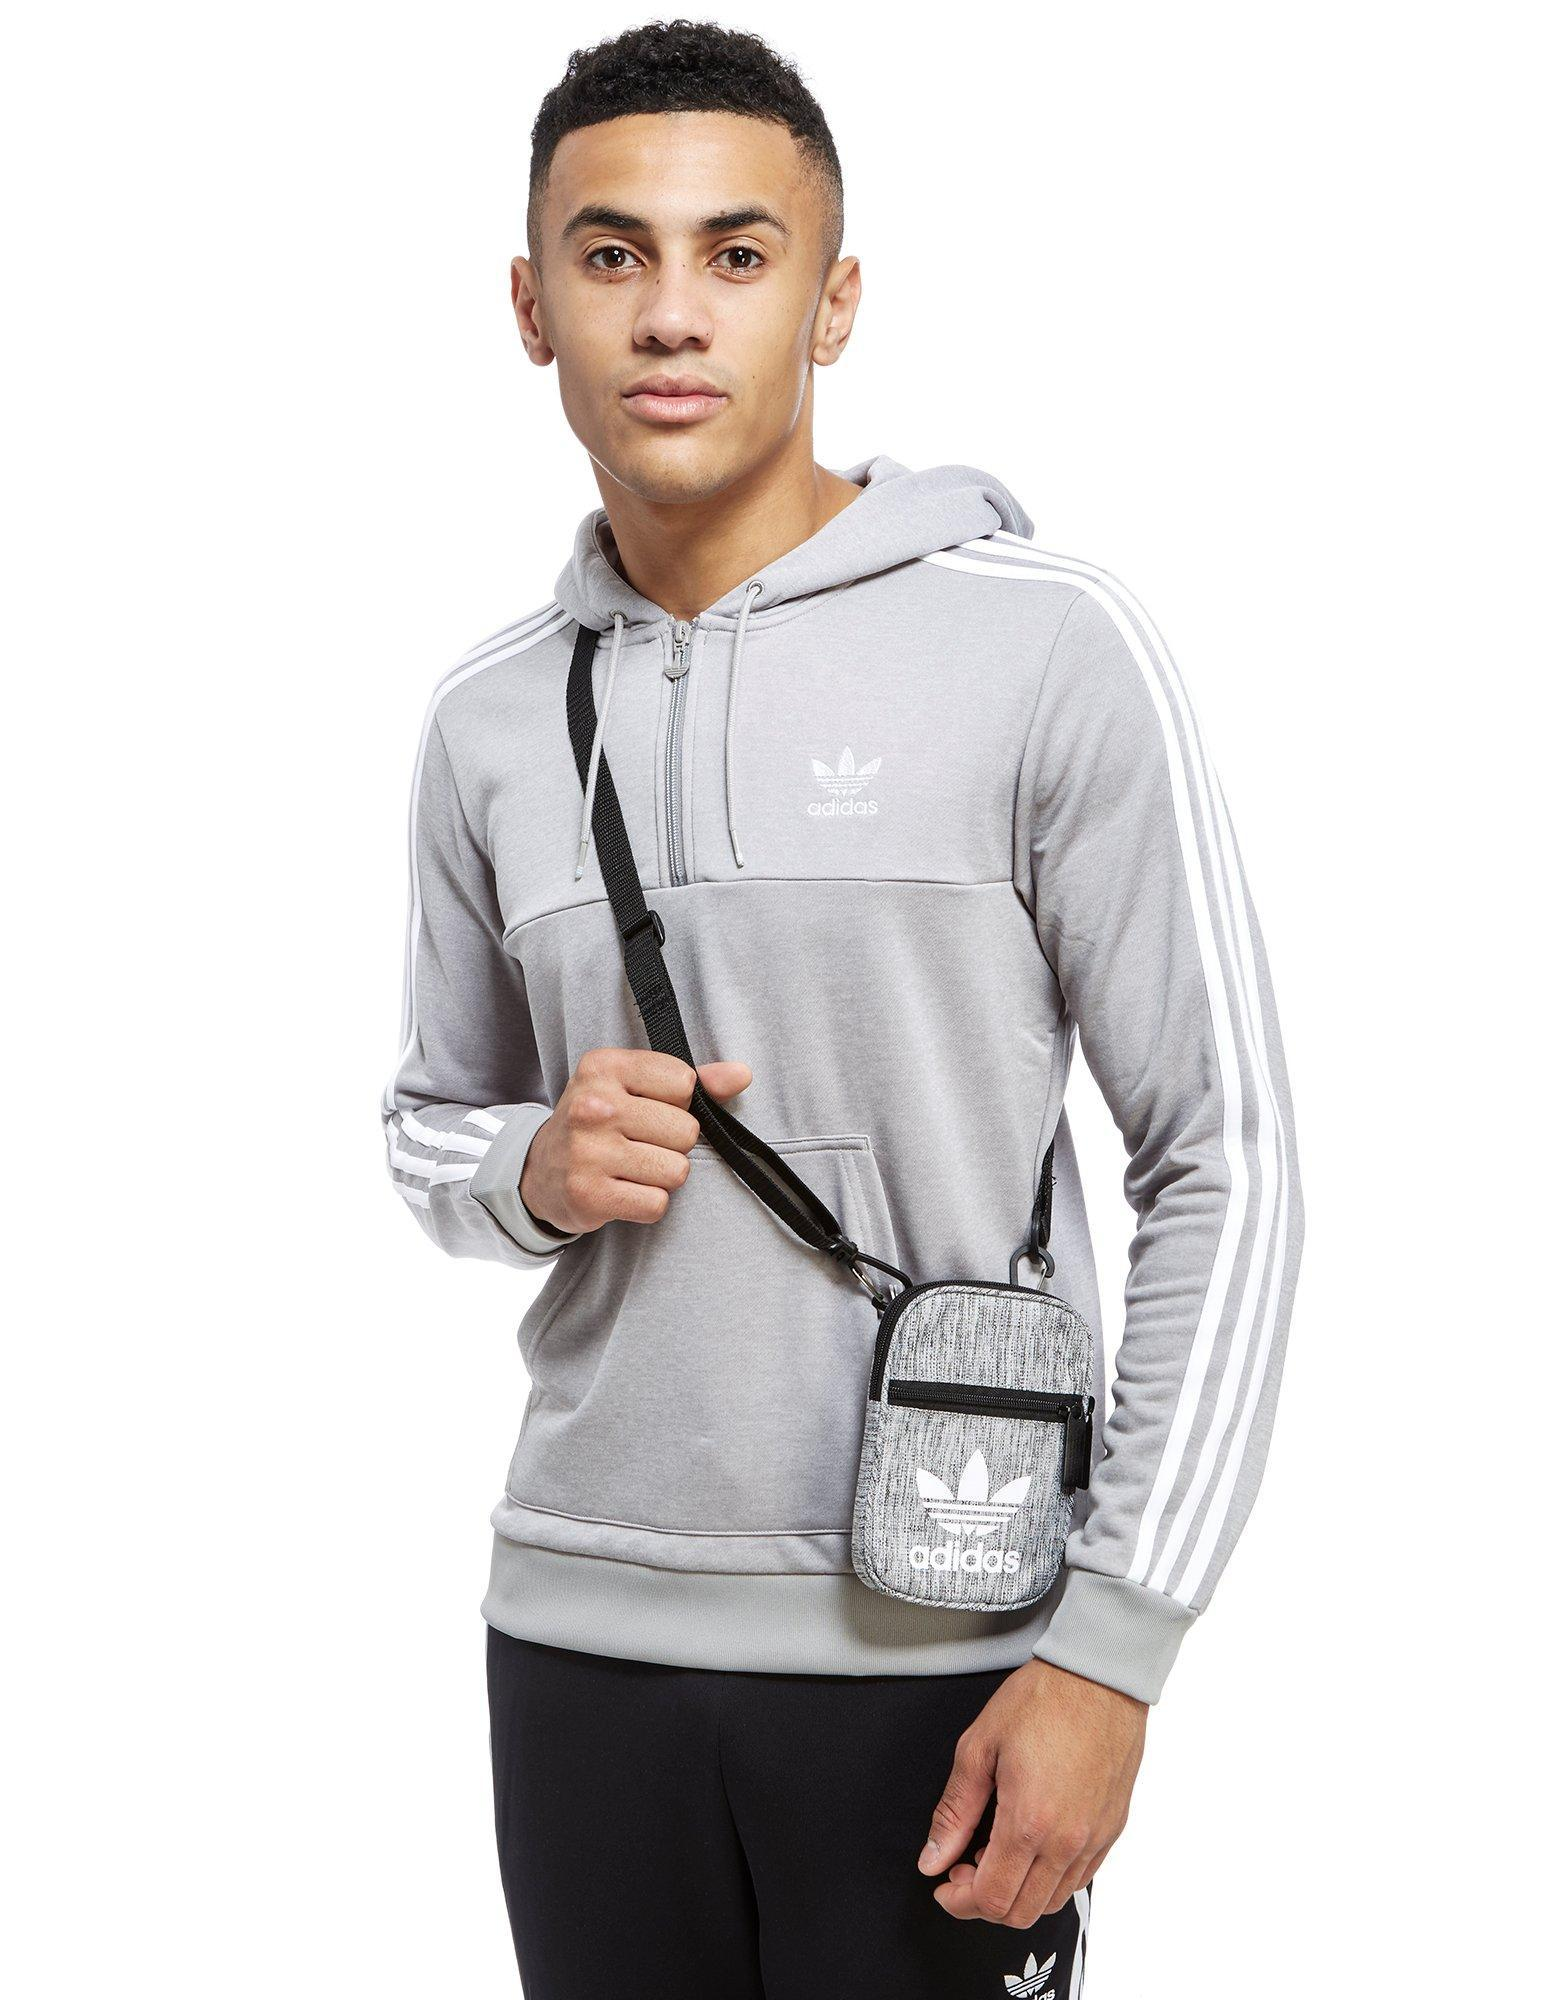 d187595d5c Lyst - adidas Originals Trefoil Festival Bag in Gray for Men